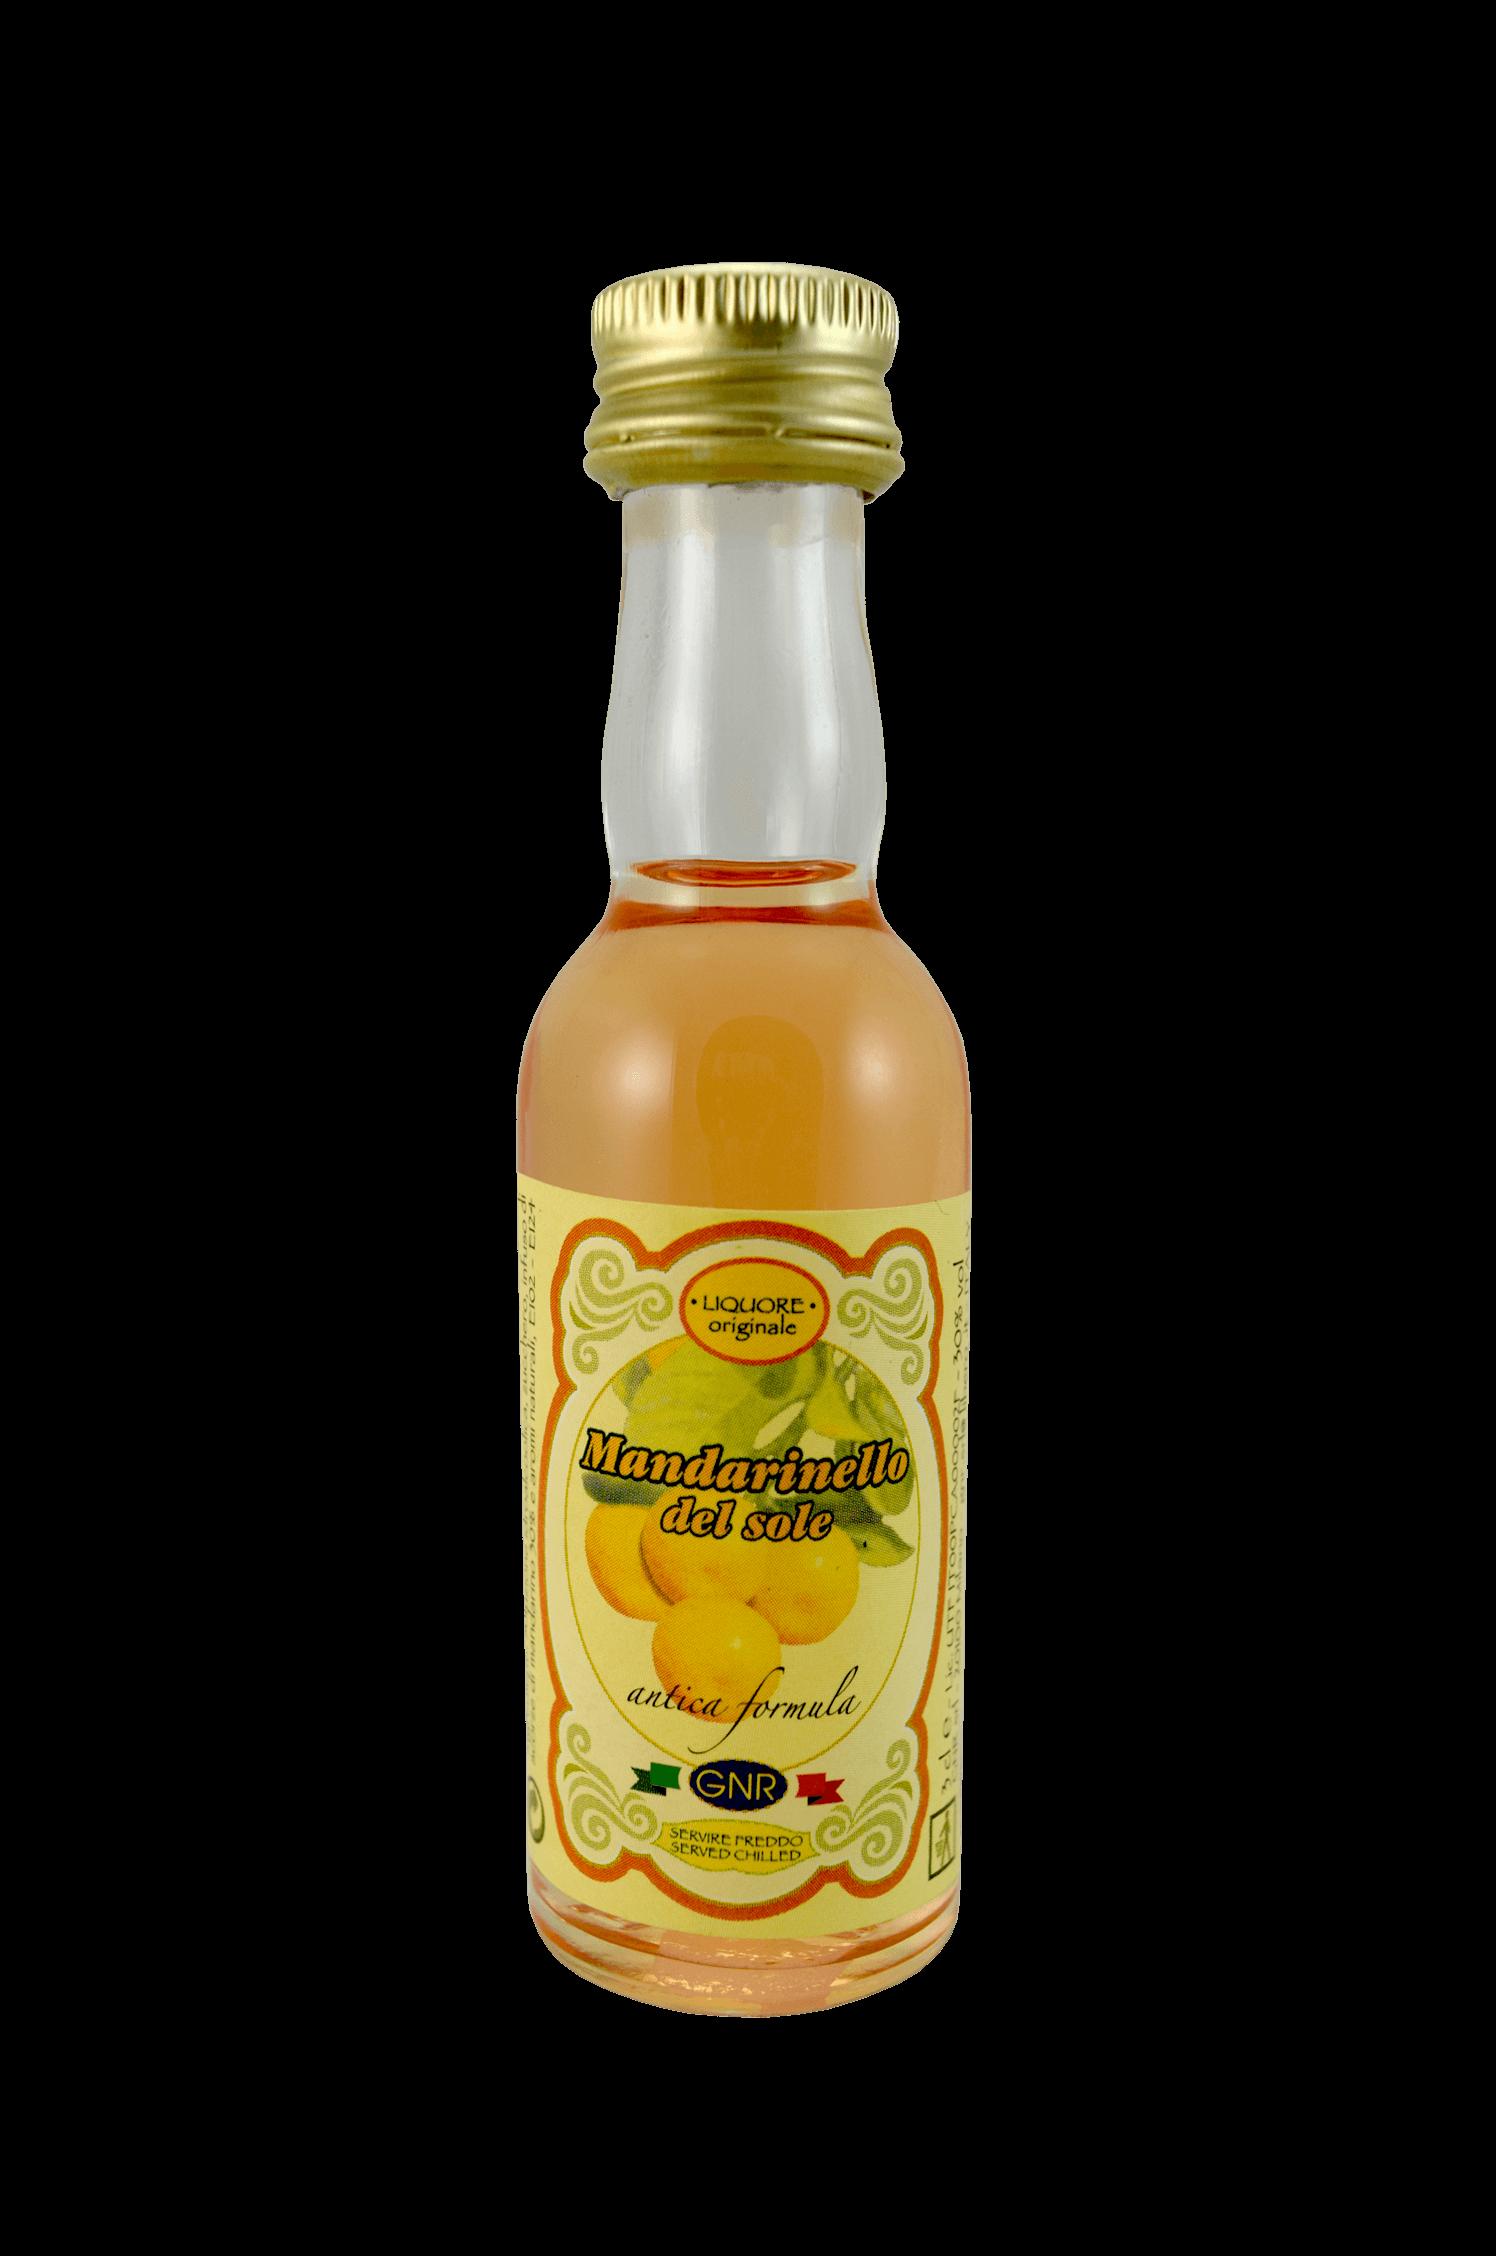 Liquore Mandarinello